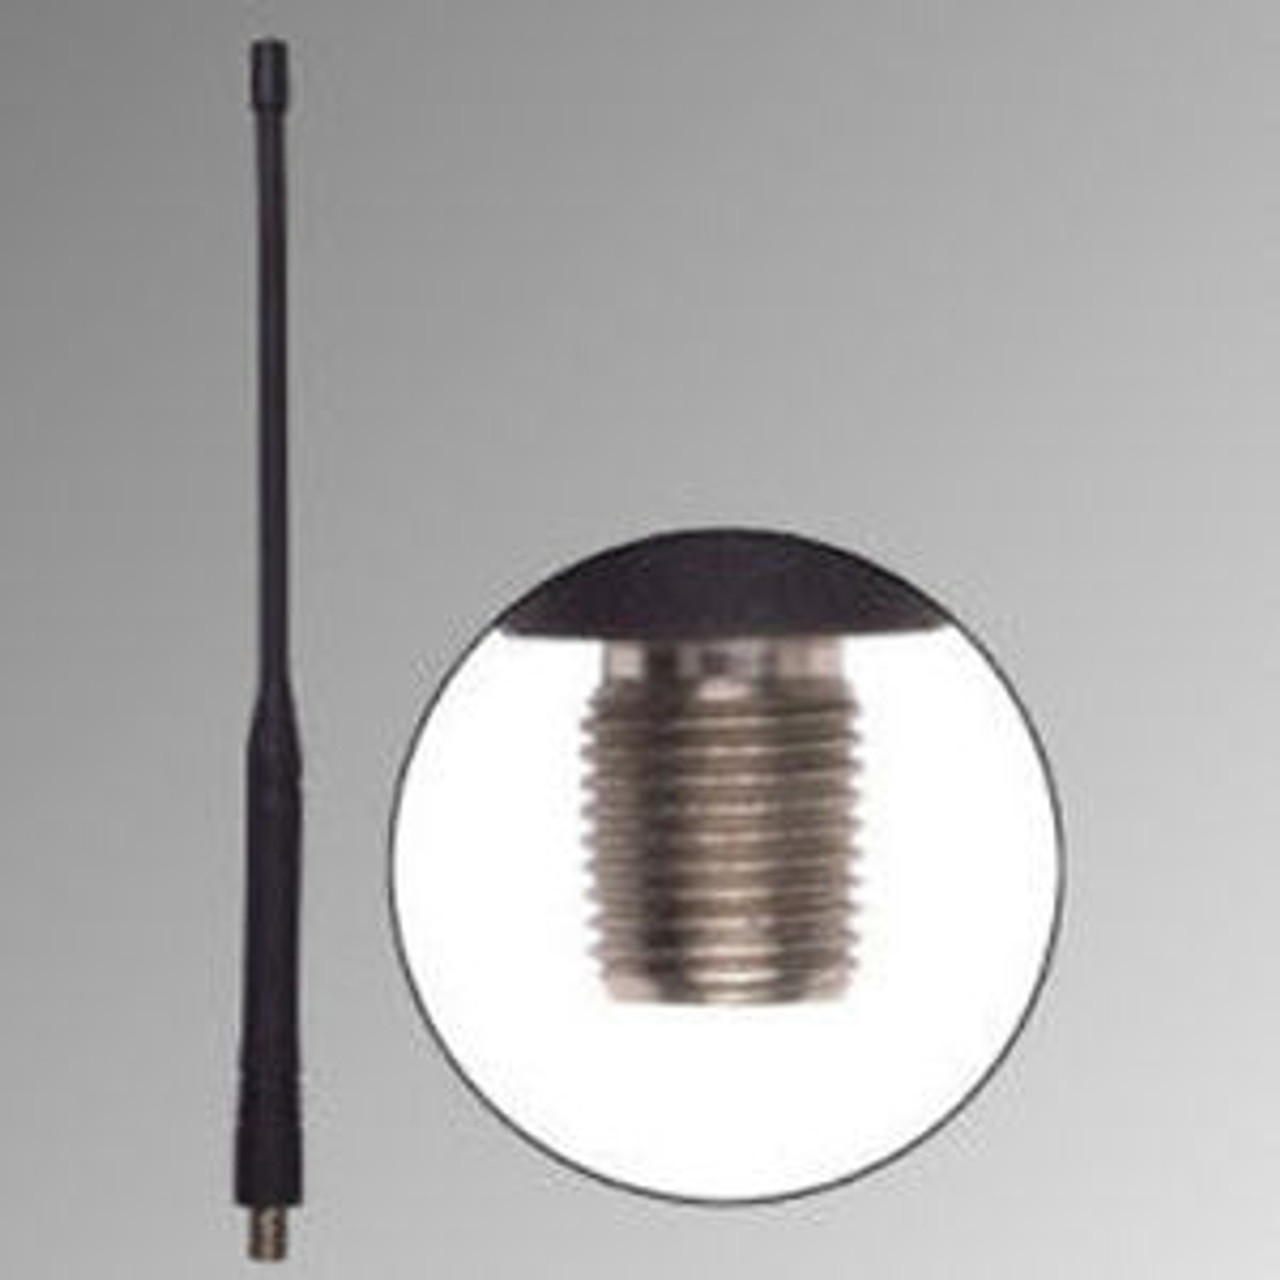 "Bendix King (All Models) Long Range Antenna - 10.5"", VHF, 145-155 MHz"